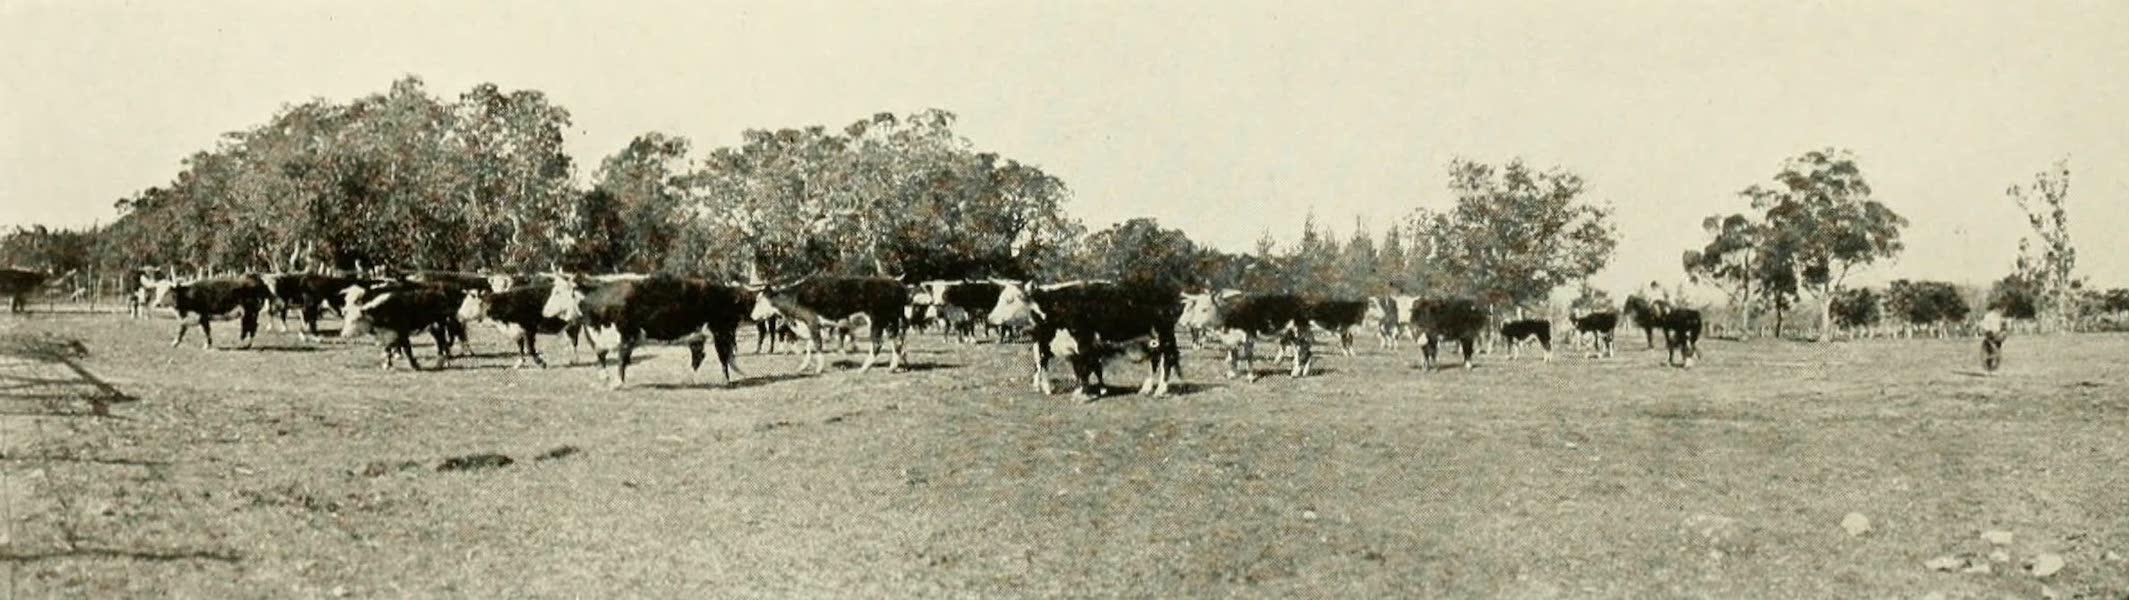 Uruguay by W. H. Koebel - Hereford Cattle on the Bichadero Estancia (1911)